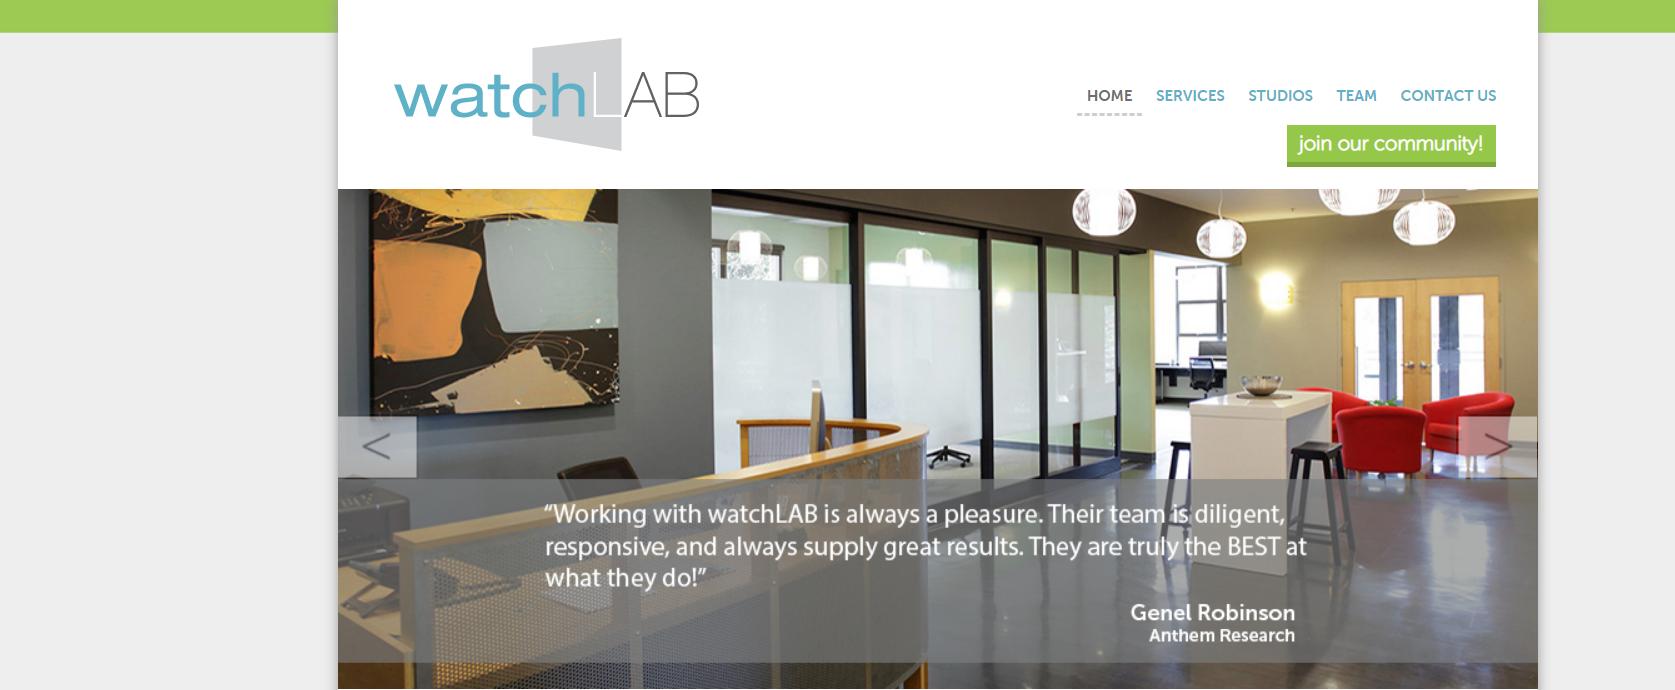 watchLAB homepage